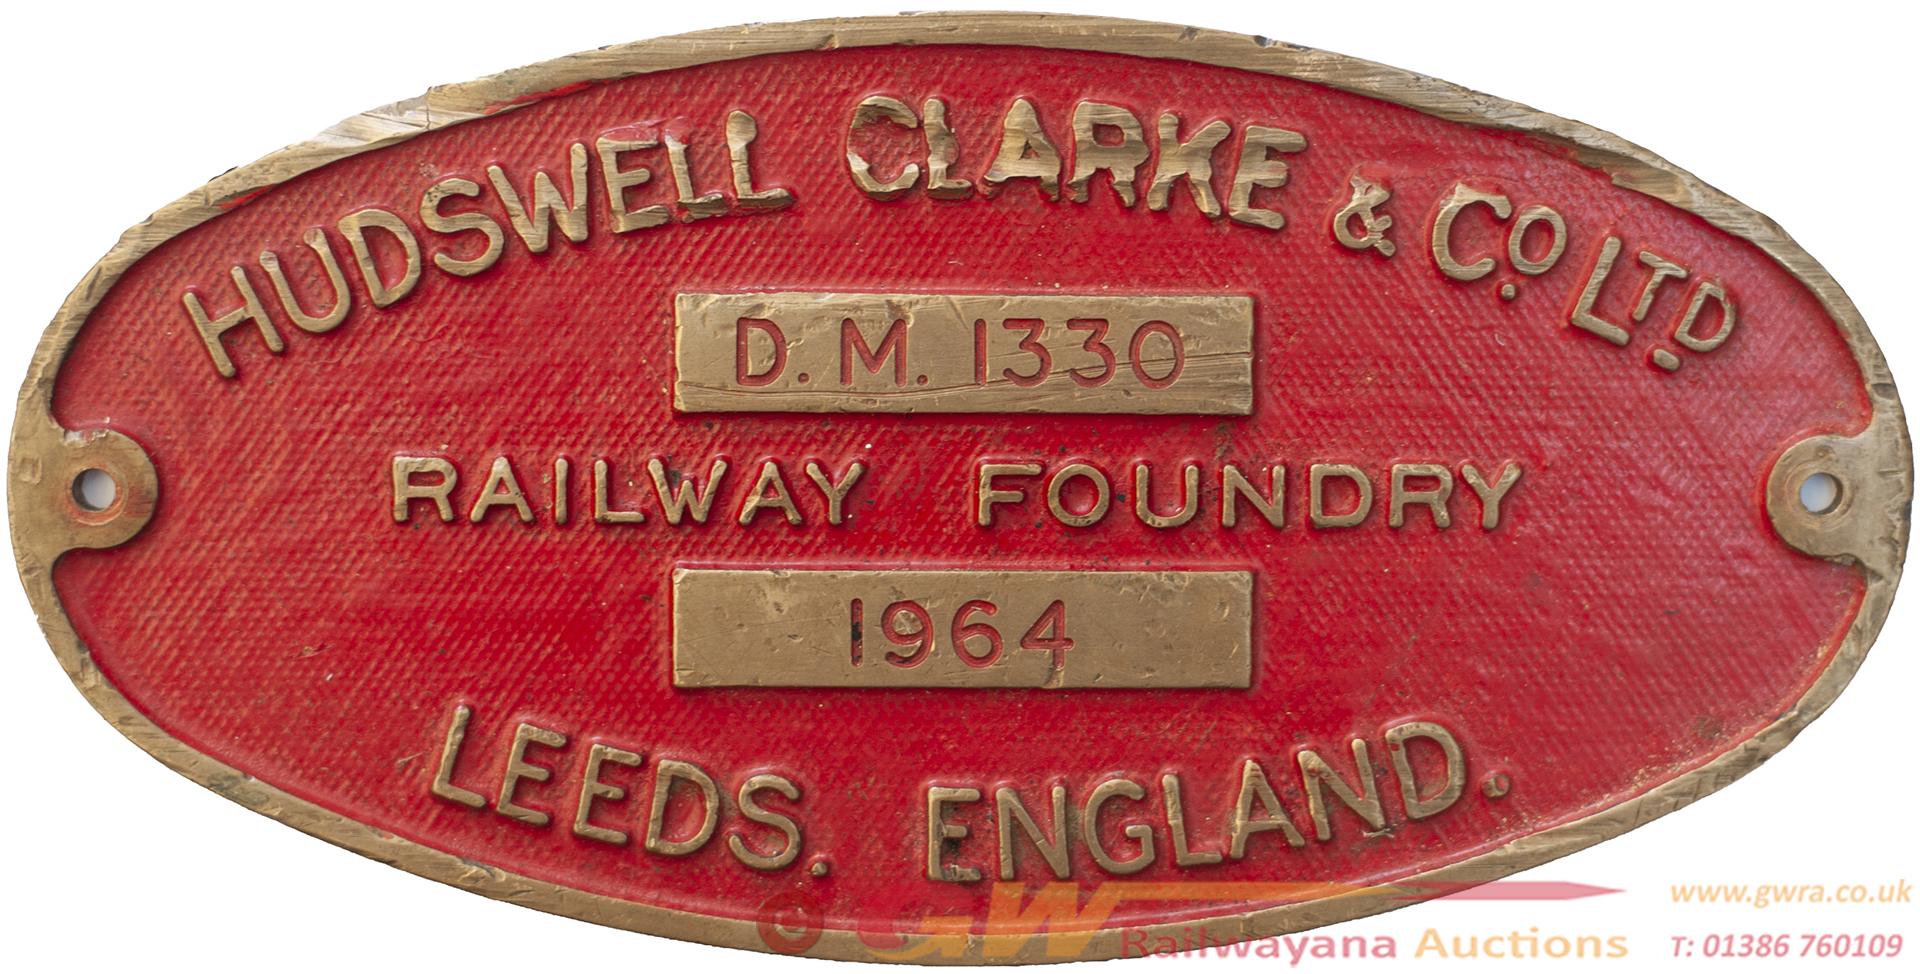 Worksplate HUDSWELL CLARKE & Co LTD RAILWAY FONDRY